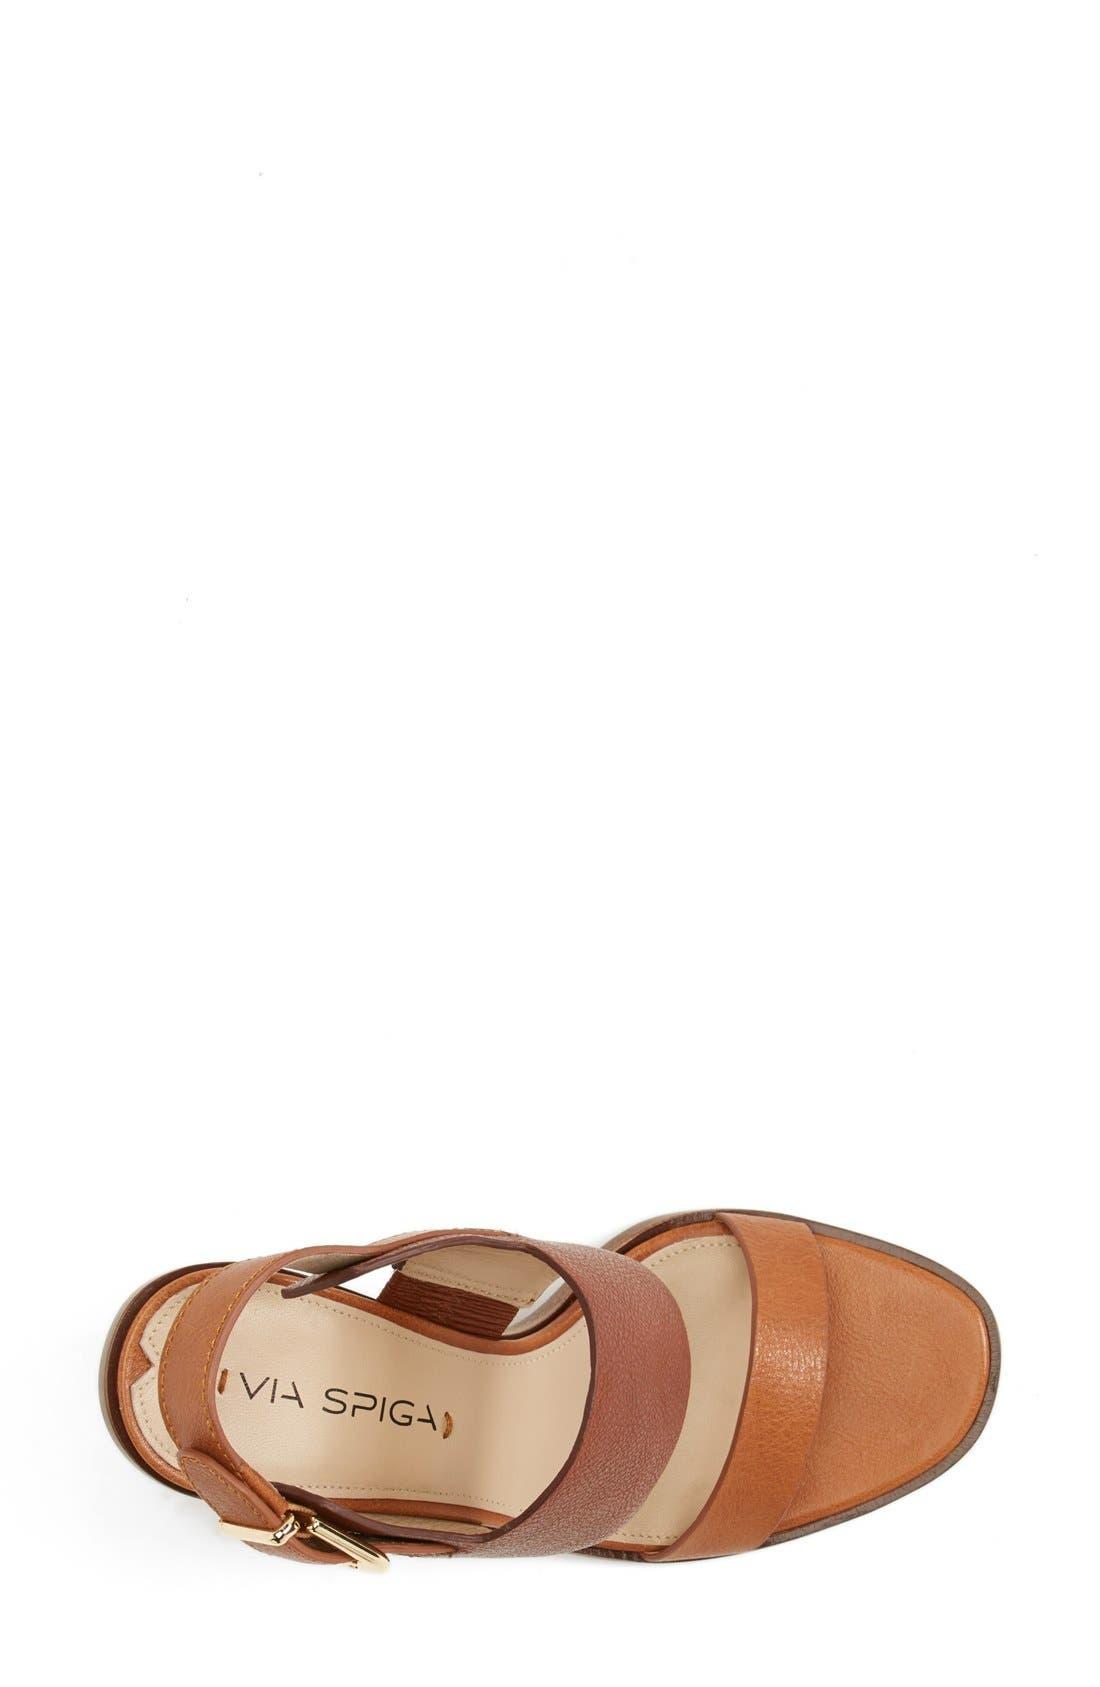 Alternate Image 3  - Via Spiga 'Baris' Leather Slingback Sandal (Women) (Nordstrom Exclusive)